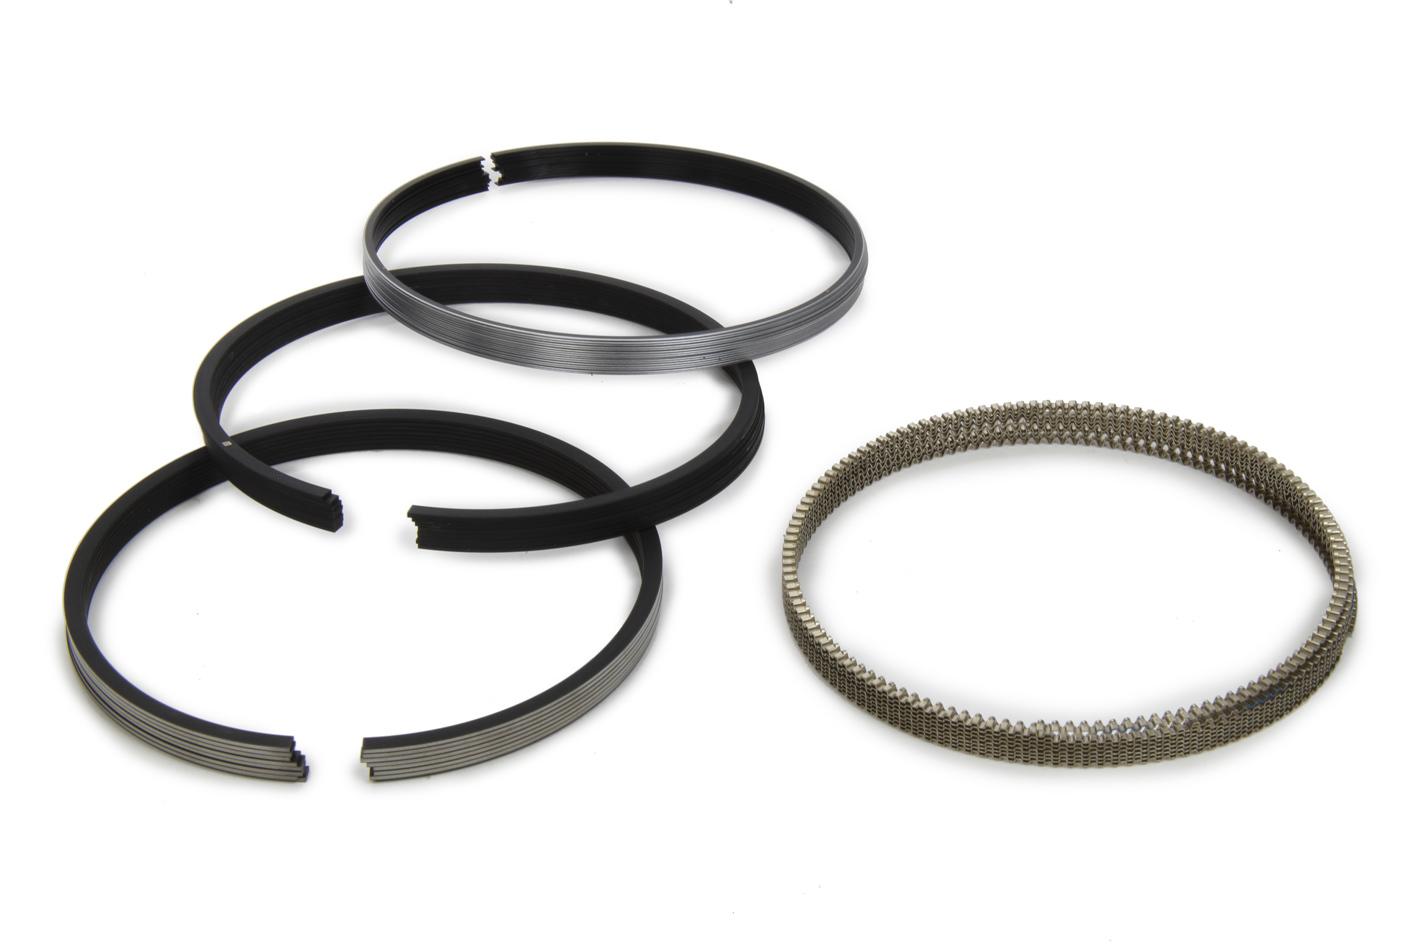 Mahle Pistons Piston Ring Set 4.060 1.5 1.5 3.0mm